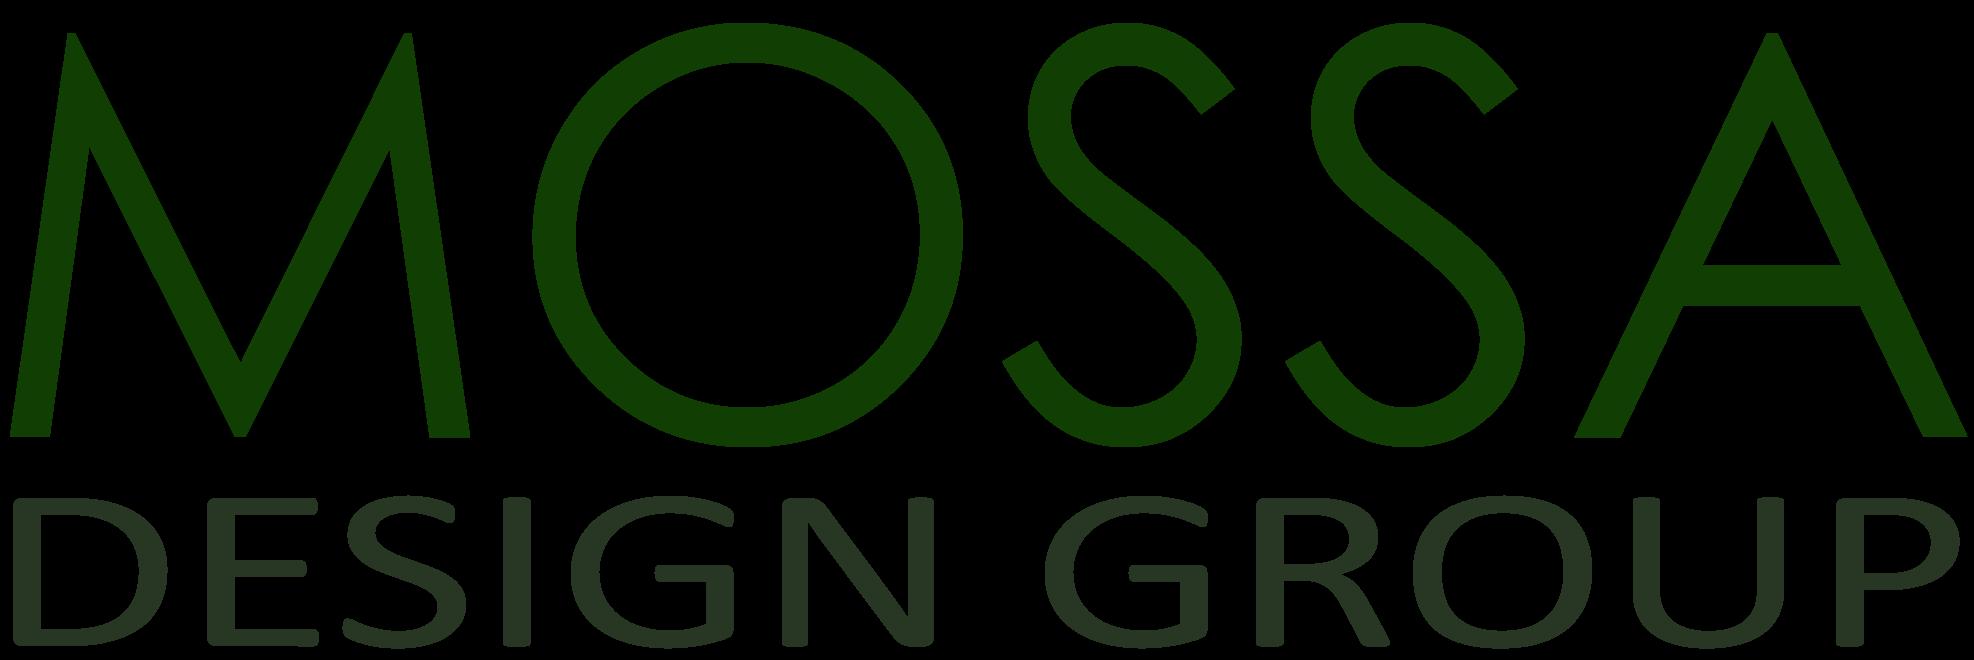 Mossa Design Group